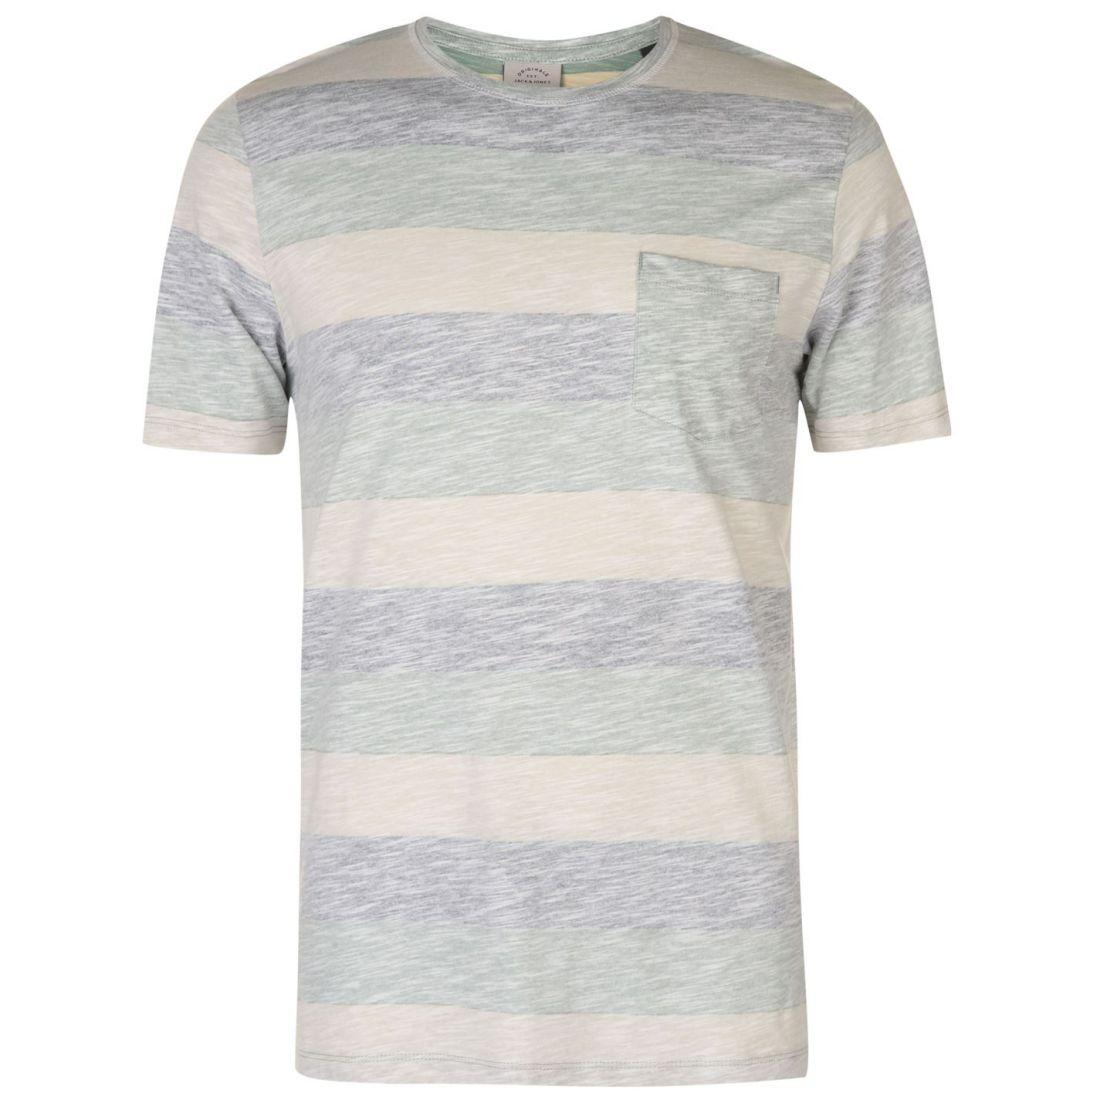 709539221ae6b Crew Clothing Shirts Ebay « Alzheimer's Network of Oregon